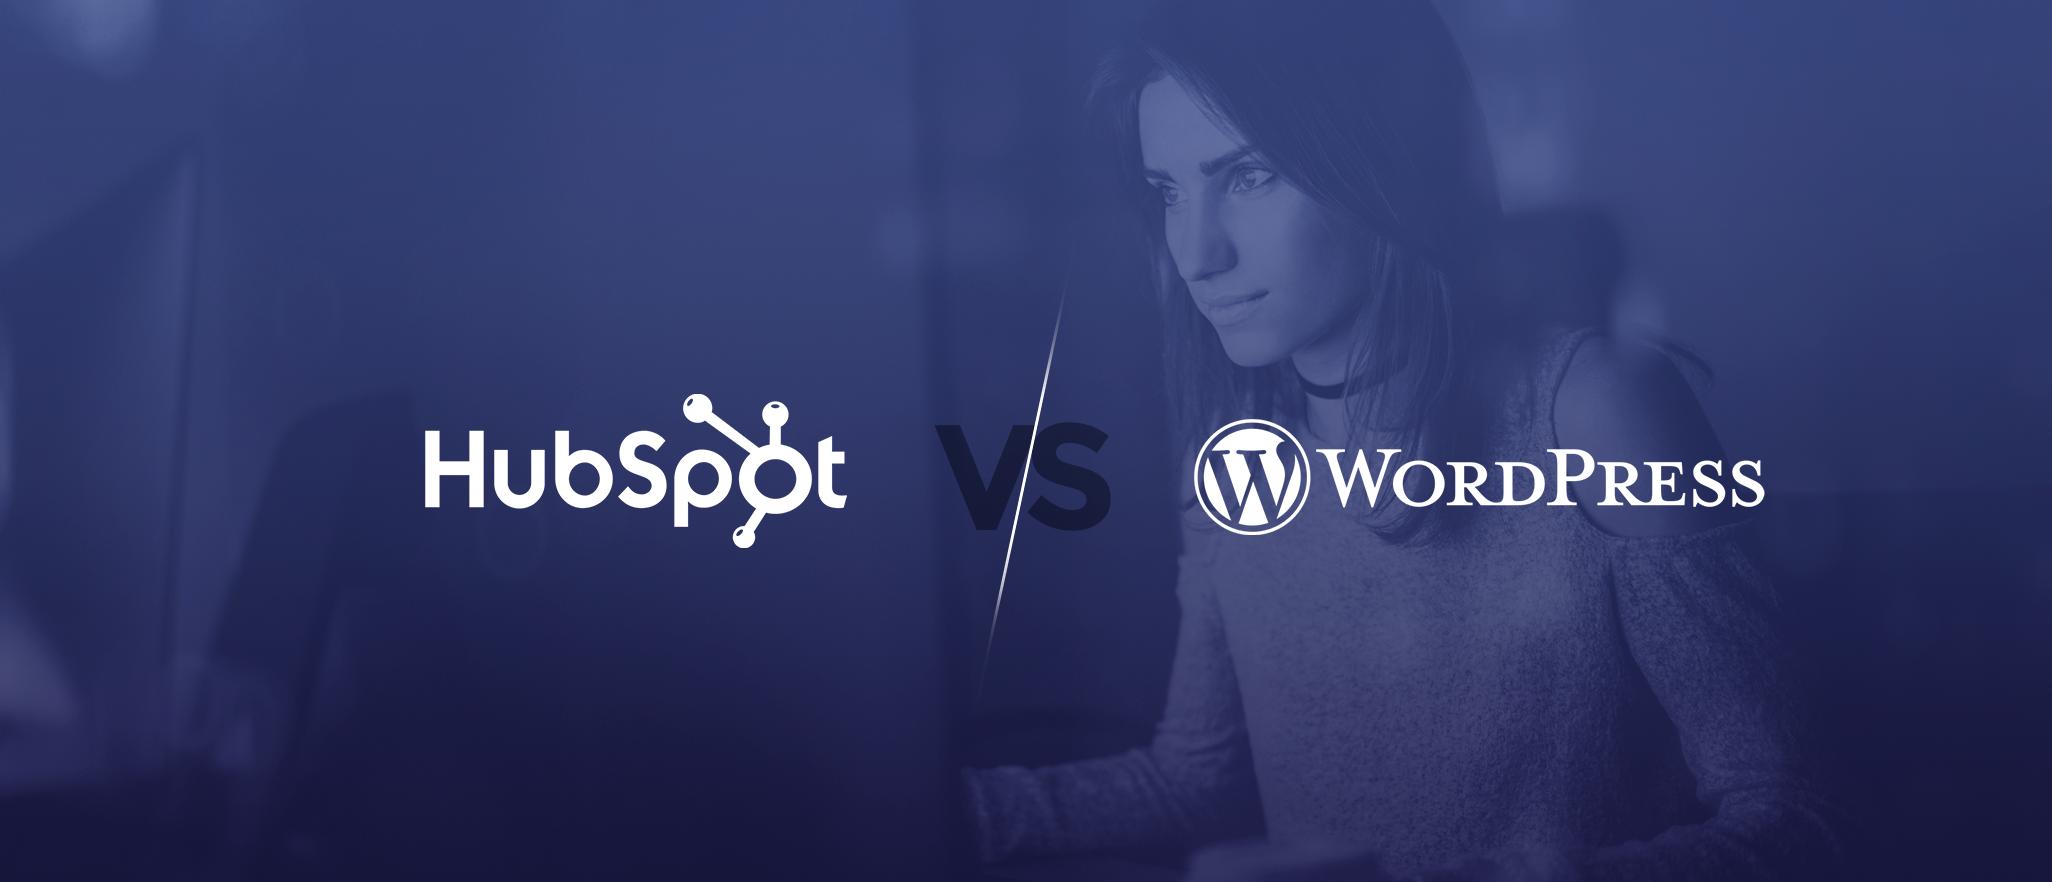 HubSpot CMS x WordPress - O Guia Definitivo